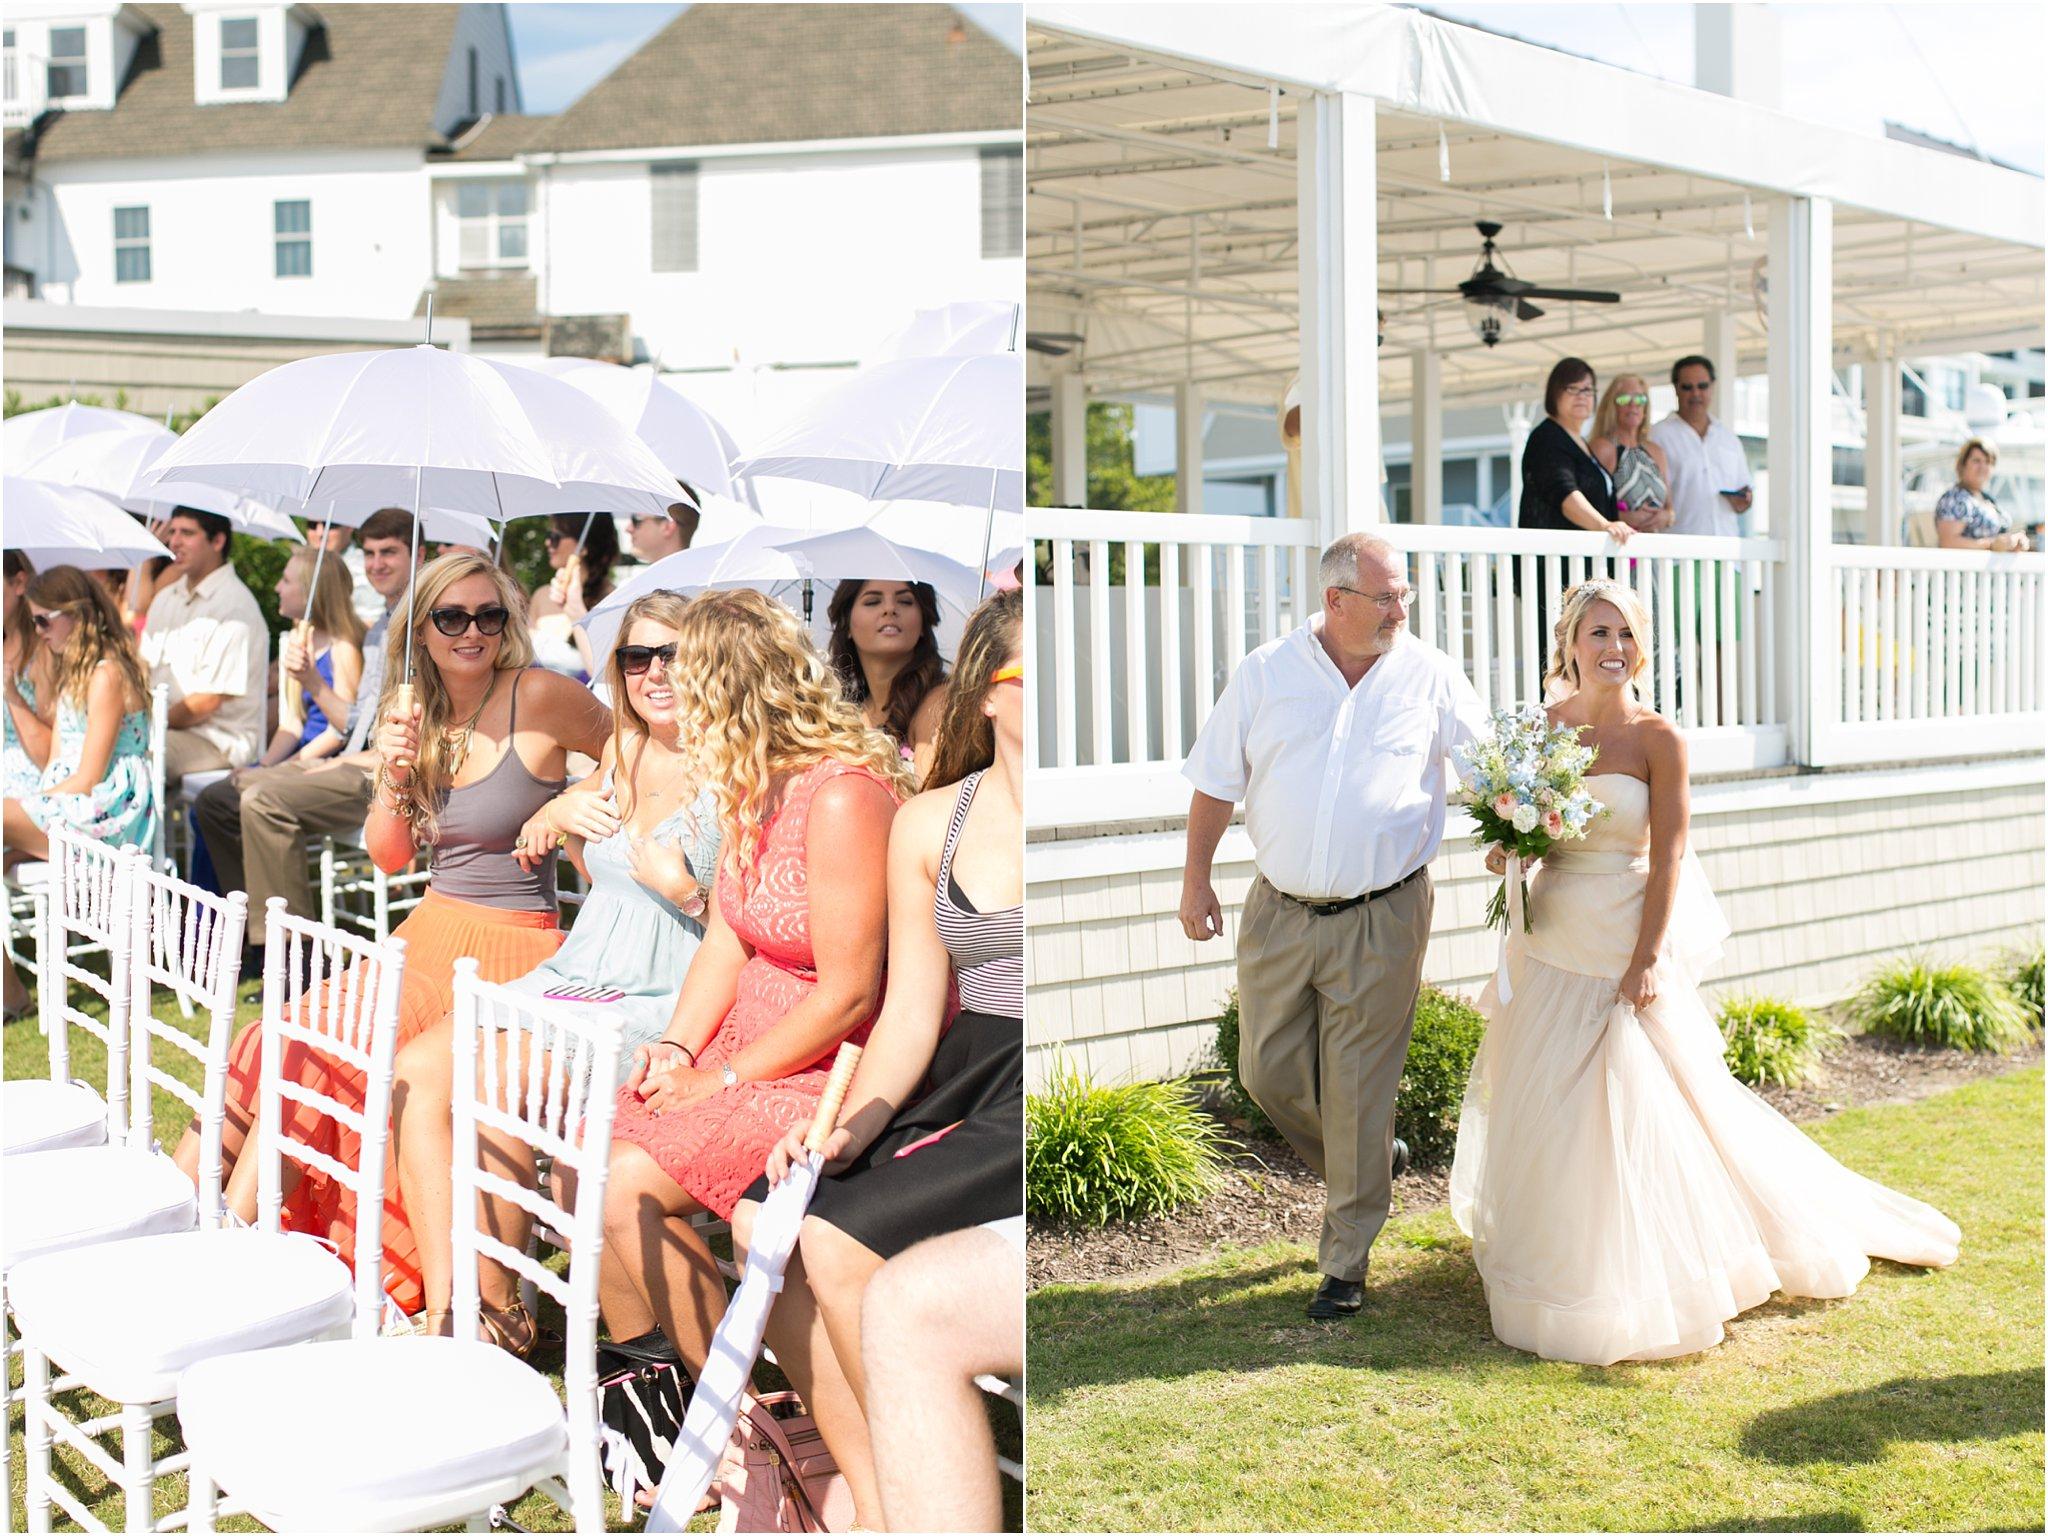 jessica_ryan_photography_virginia_beach_water_tabe_wedding_vera_wang_wedding_dress_0604